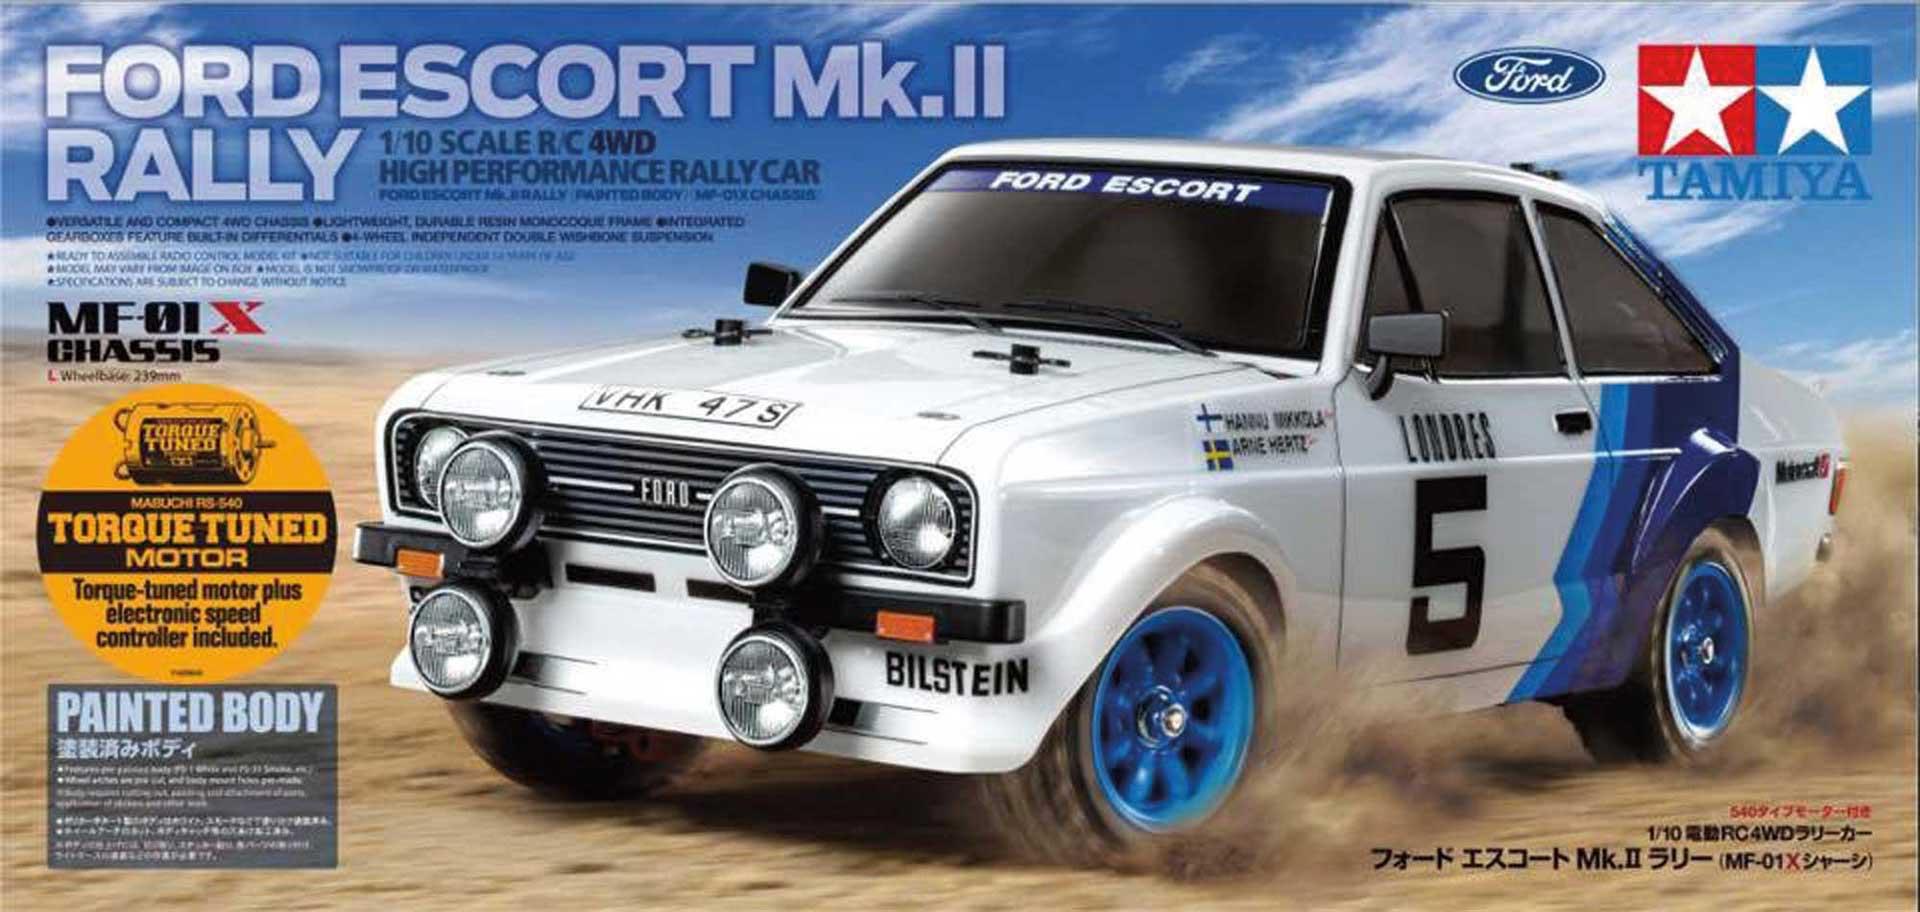 TAMIYA Ford Escort MkII Rallye MF-01X 1/10 4WD Kit (inkl. lackierter Karosserie)